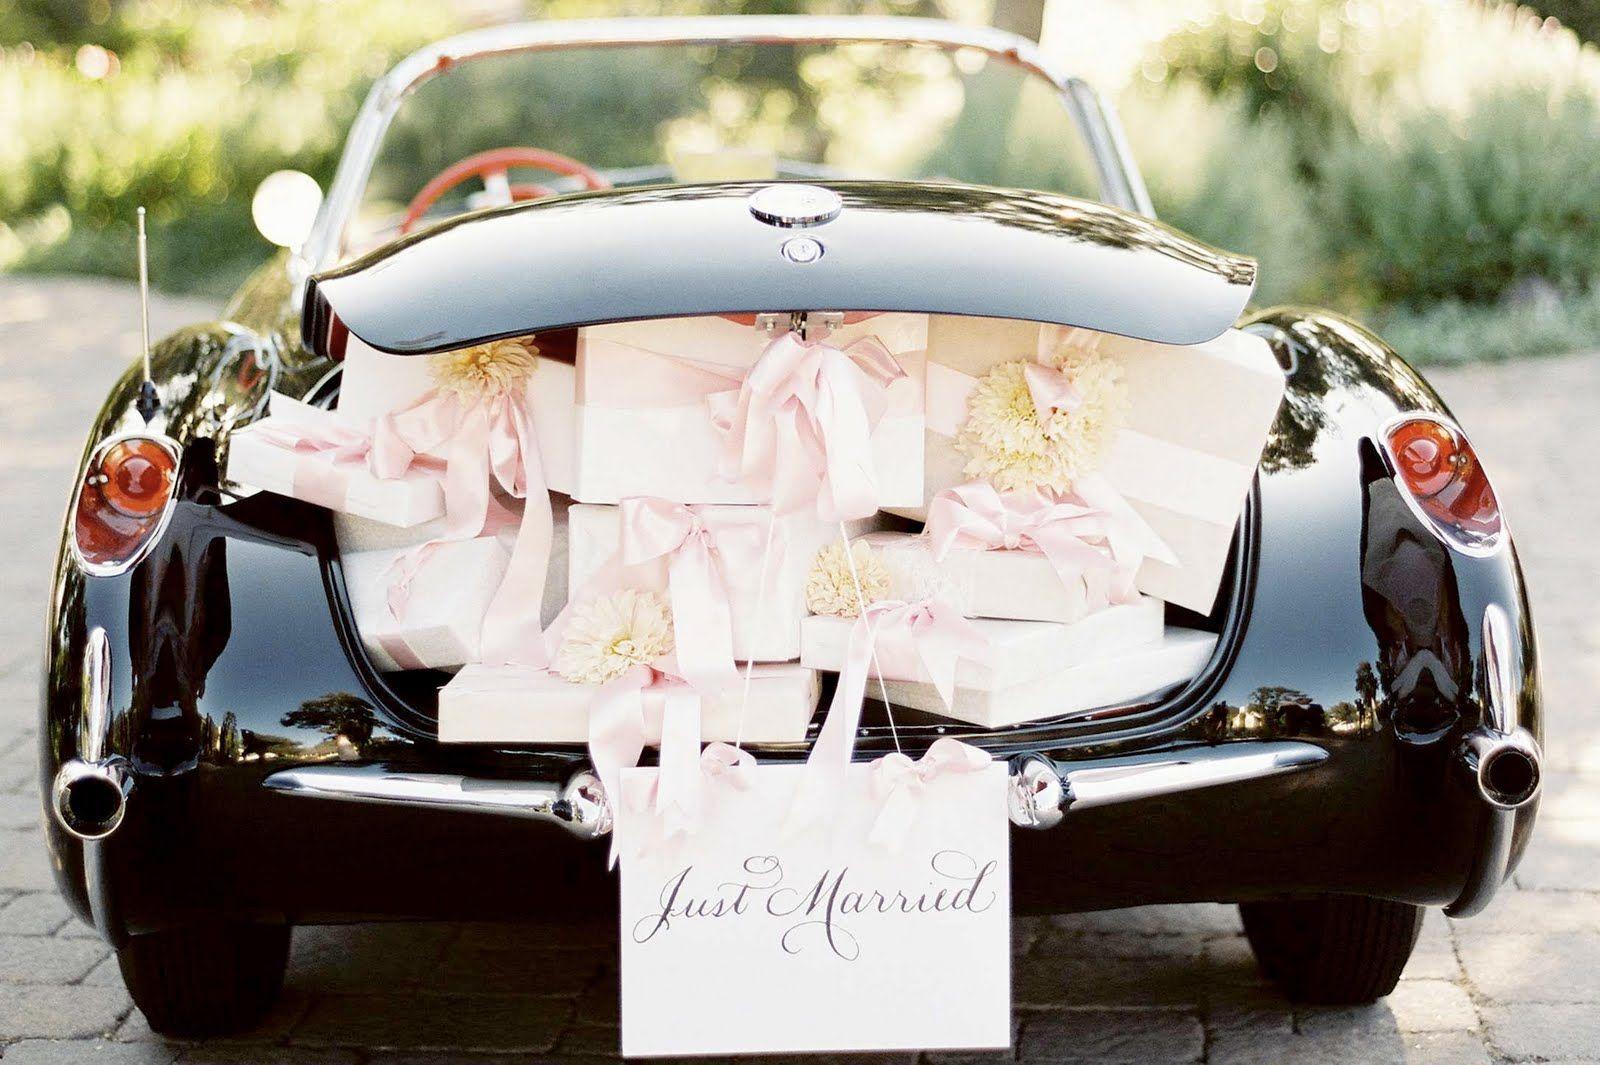 Wedding car decorations just married  Pin by Delaney Smith on wedding  Pinterest  Wedding getaway car